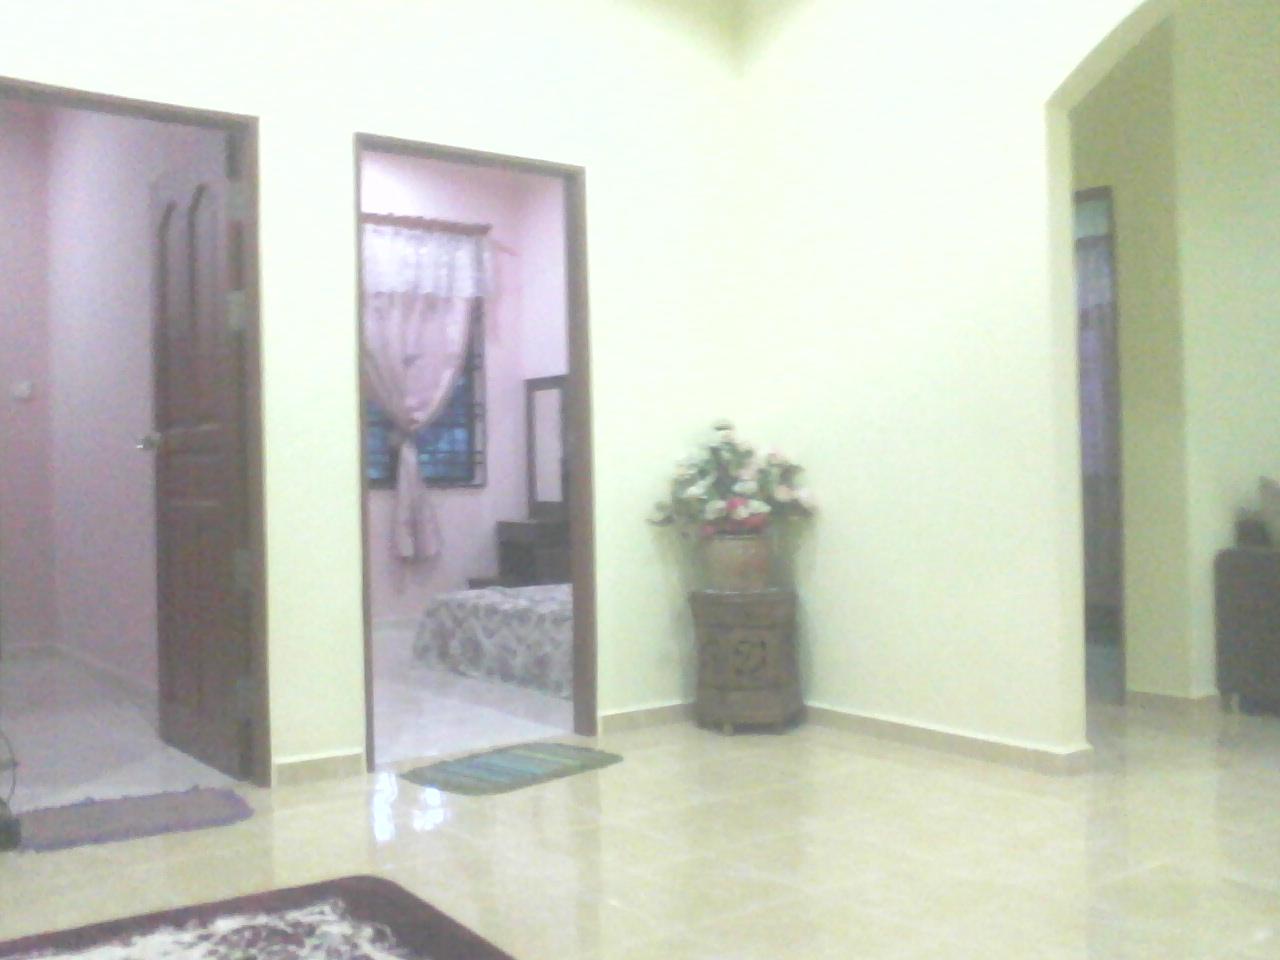 Lala homestay di kota bharu rm150 sehari dinklate for J bathroom kota bharu